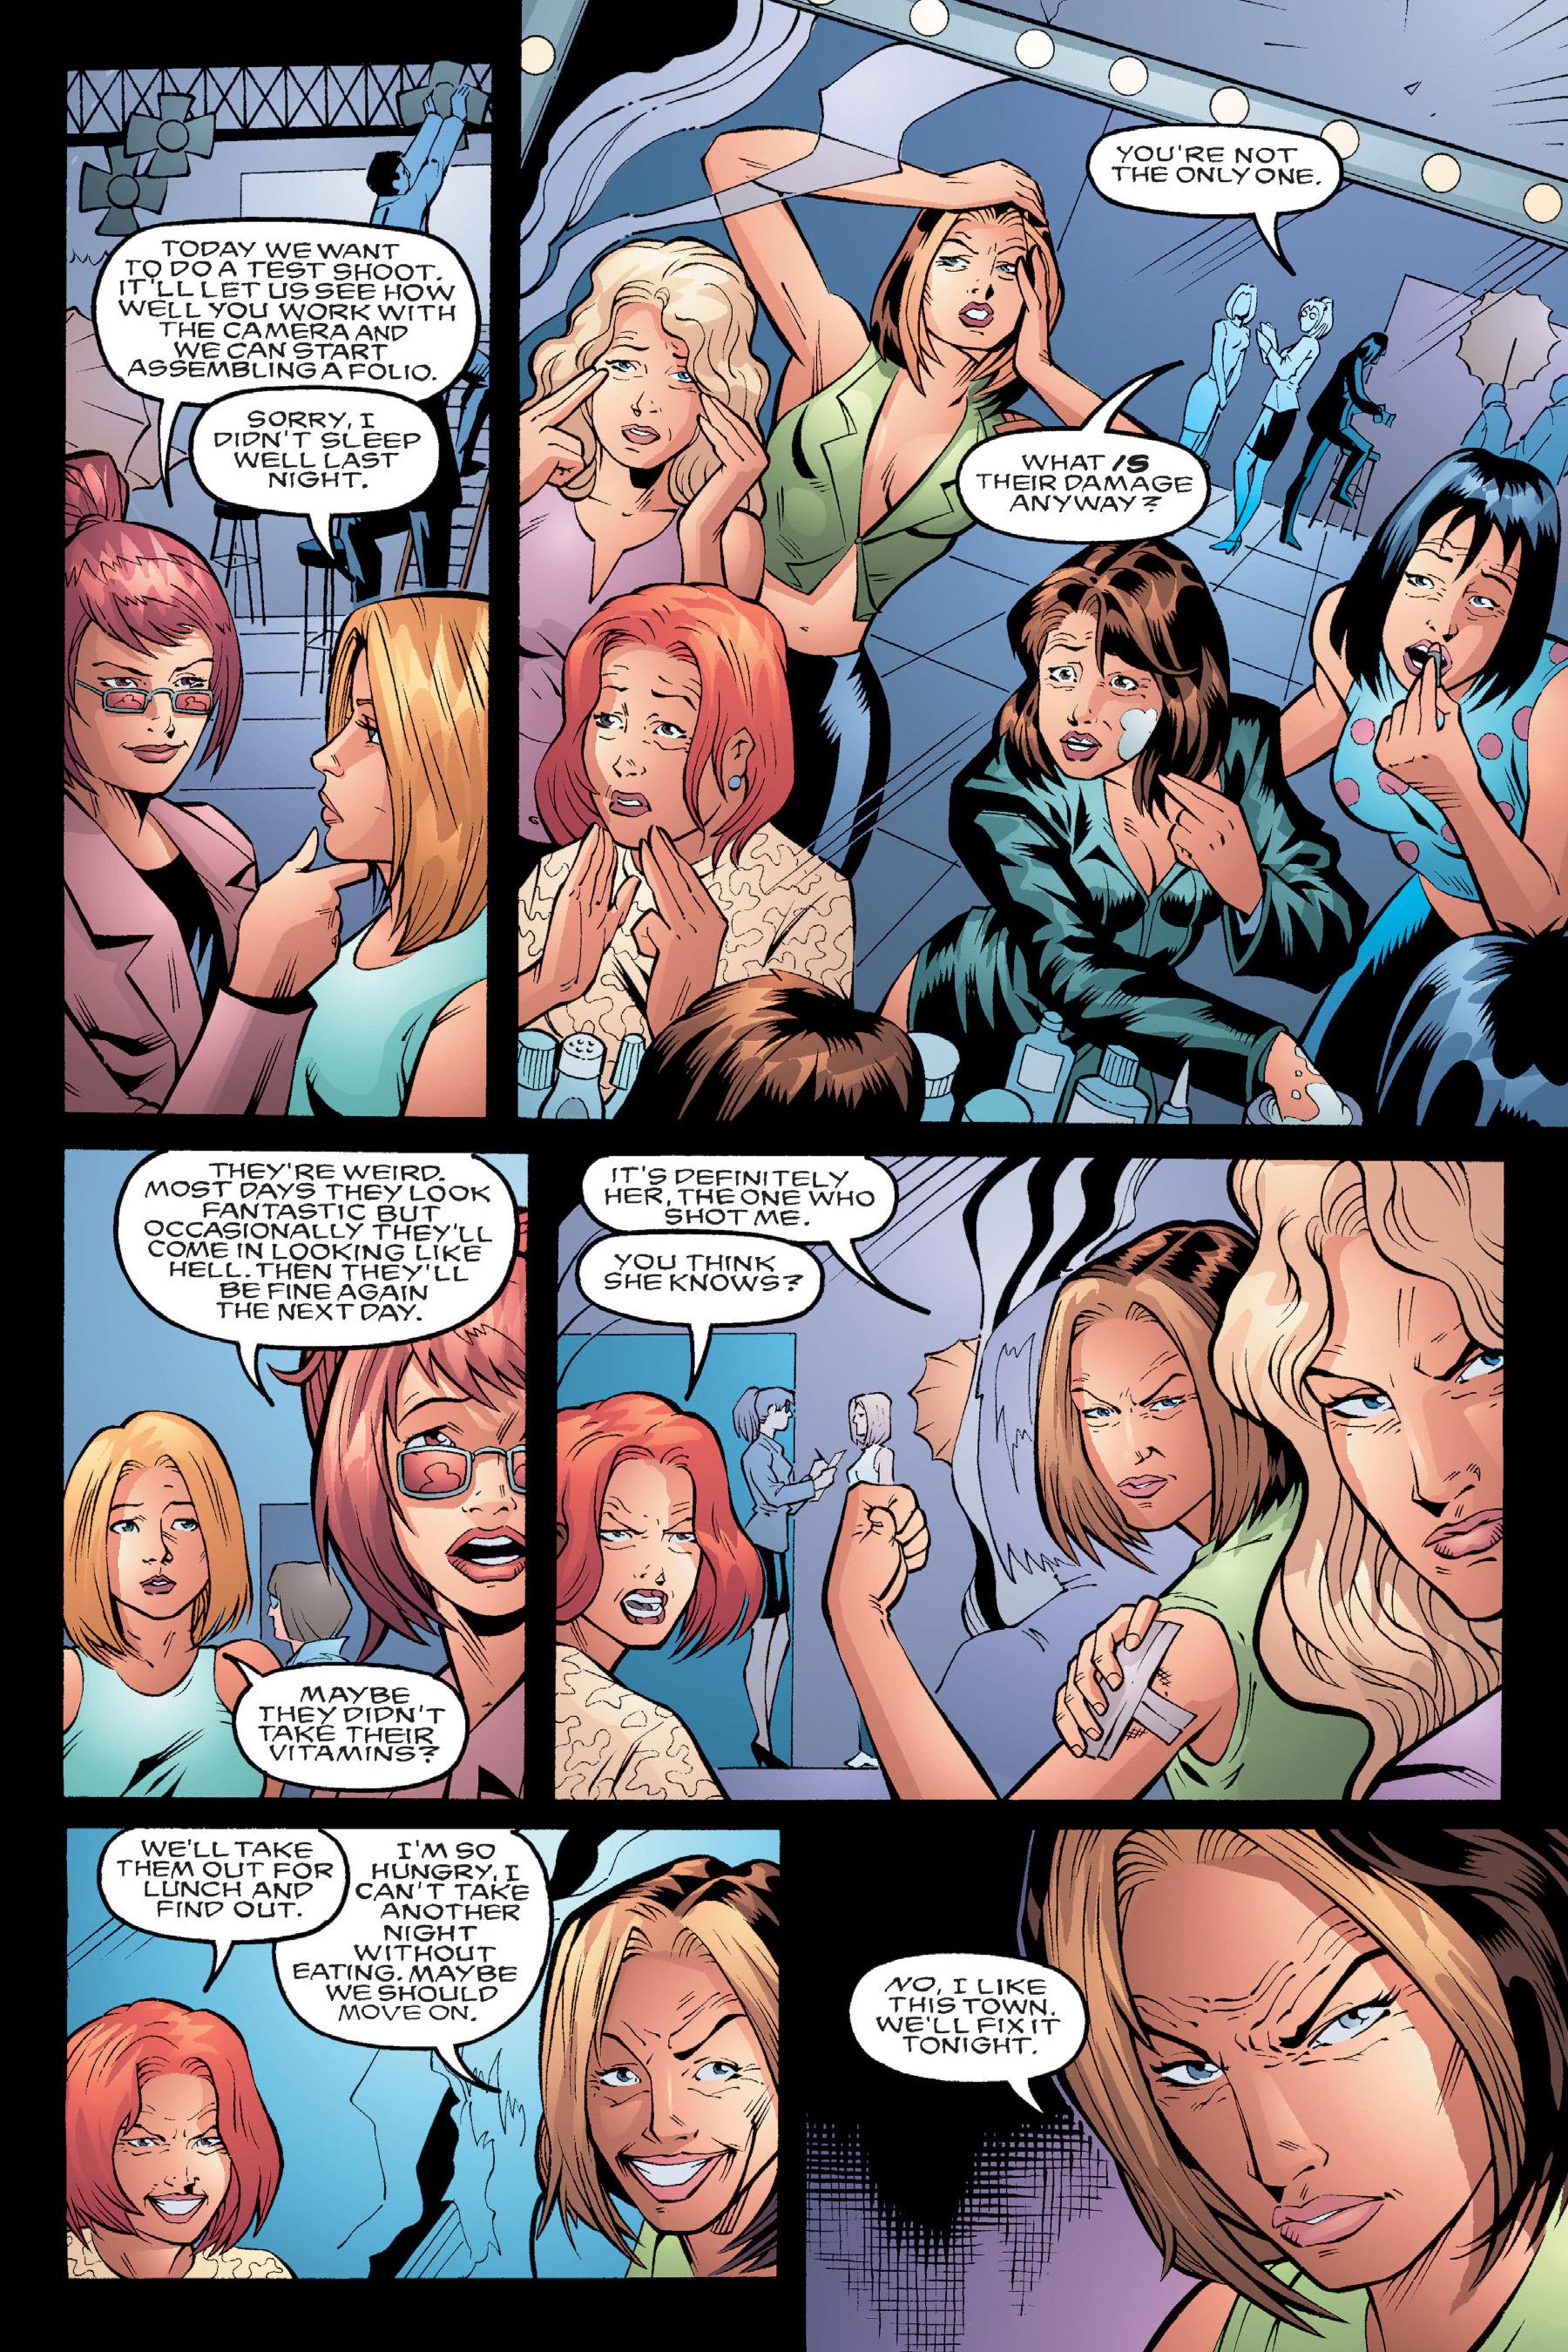 Read online Buffy the Vampire Slayer: Omnibus comic -  Issue # TPB 4 - 45